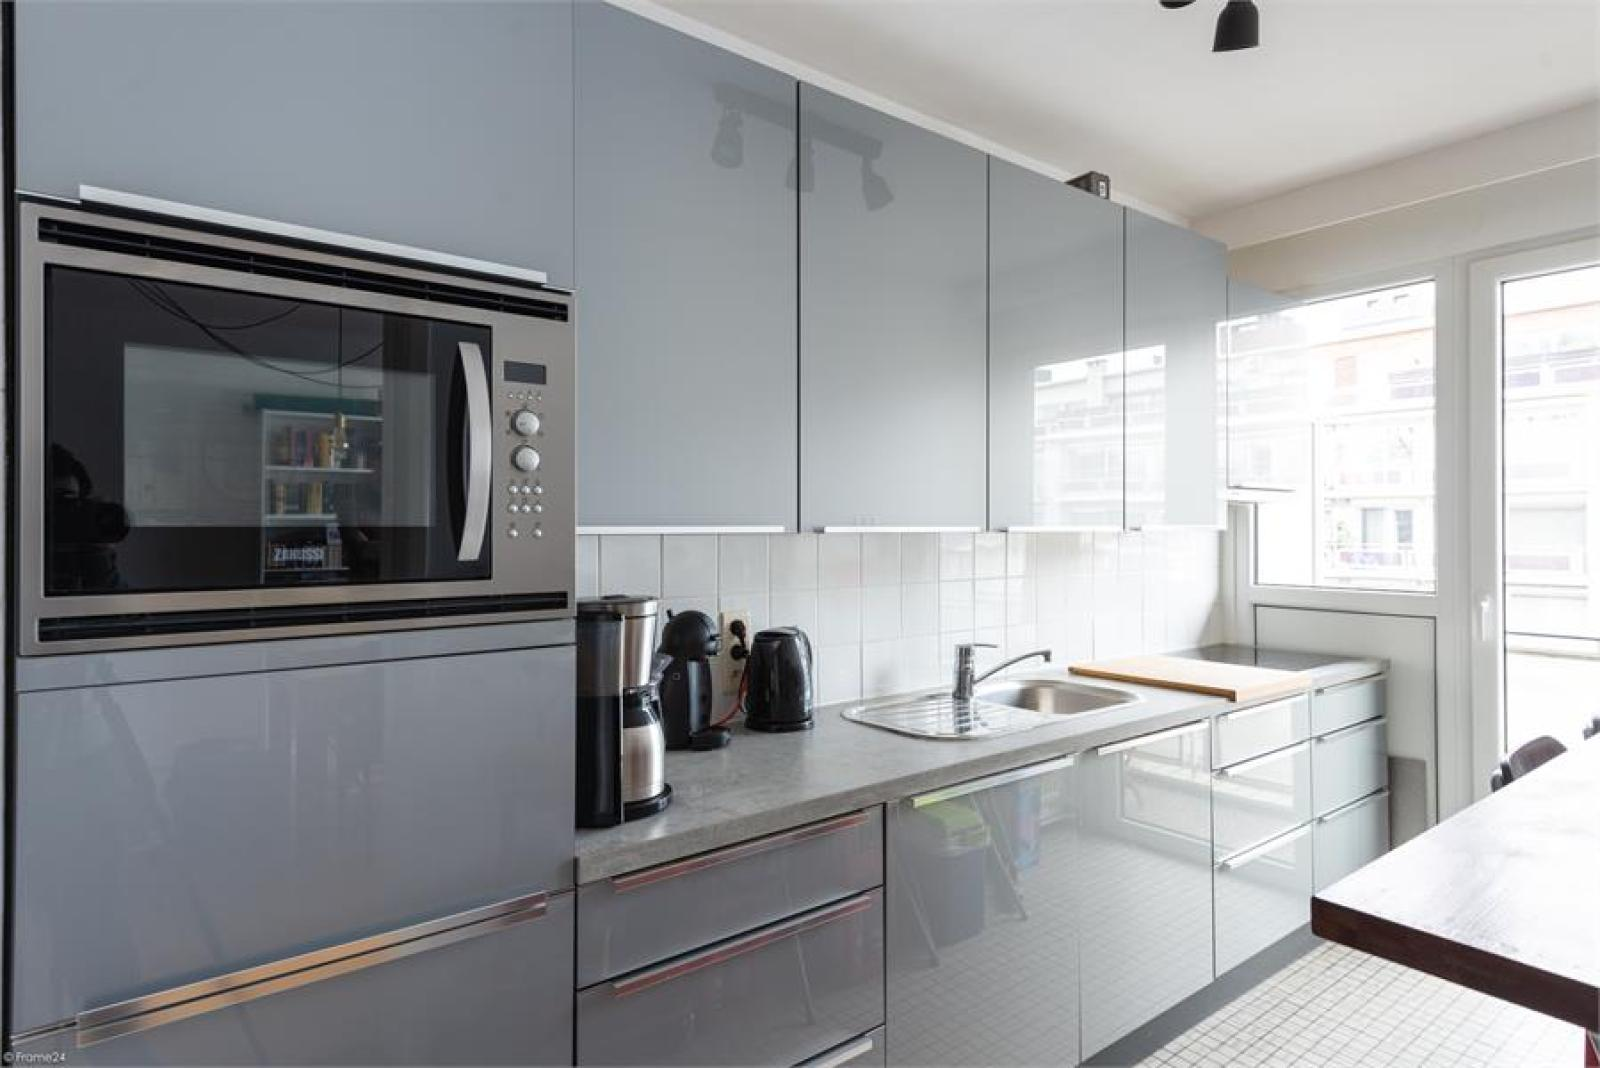 Instapklaar appartement (77 m²) met twee slaapkamers op centrale ligging te Deurne! afbeelding 7